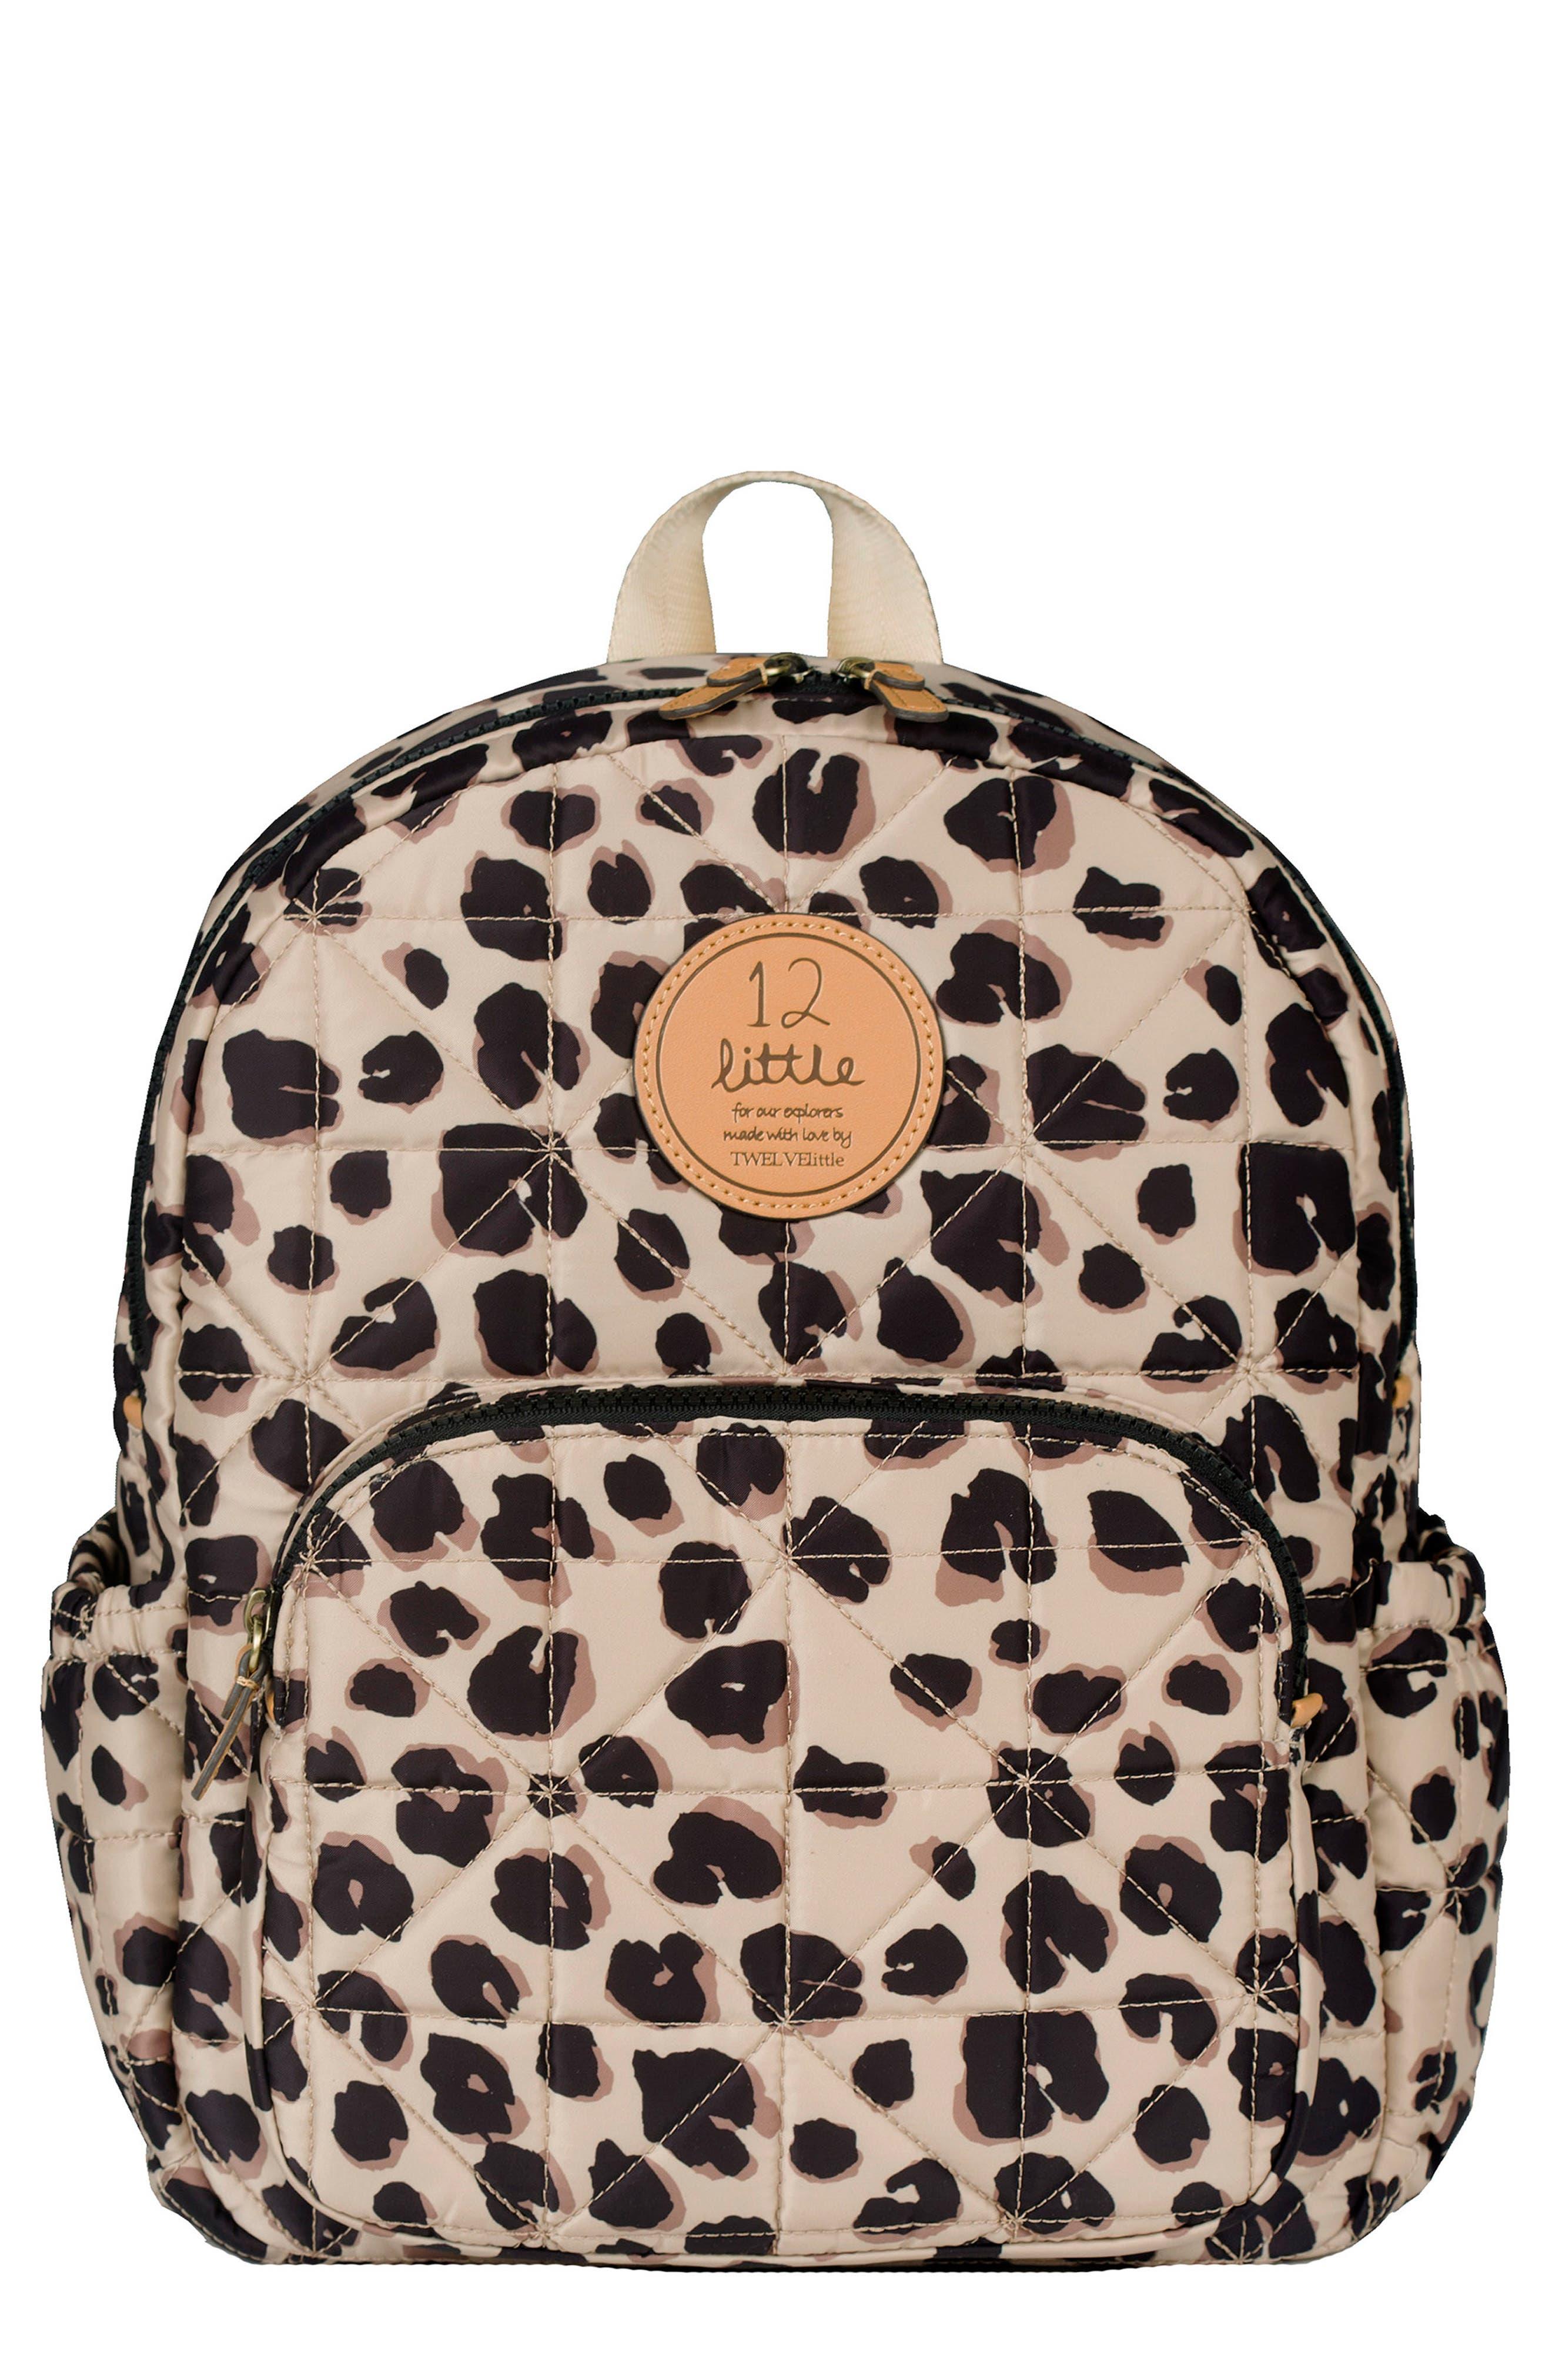 Twelvelittle Little Companion Backpack -